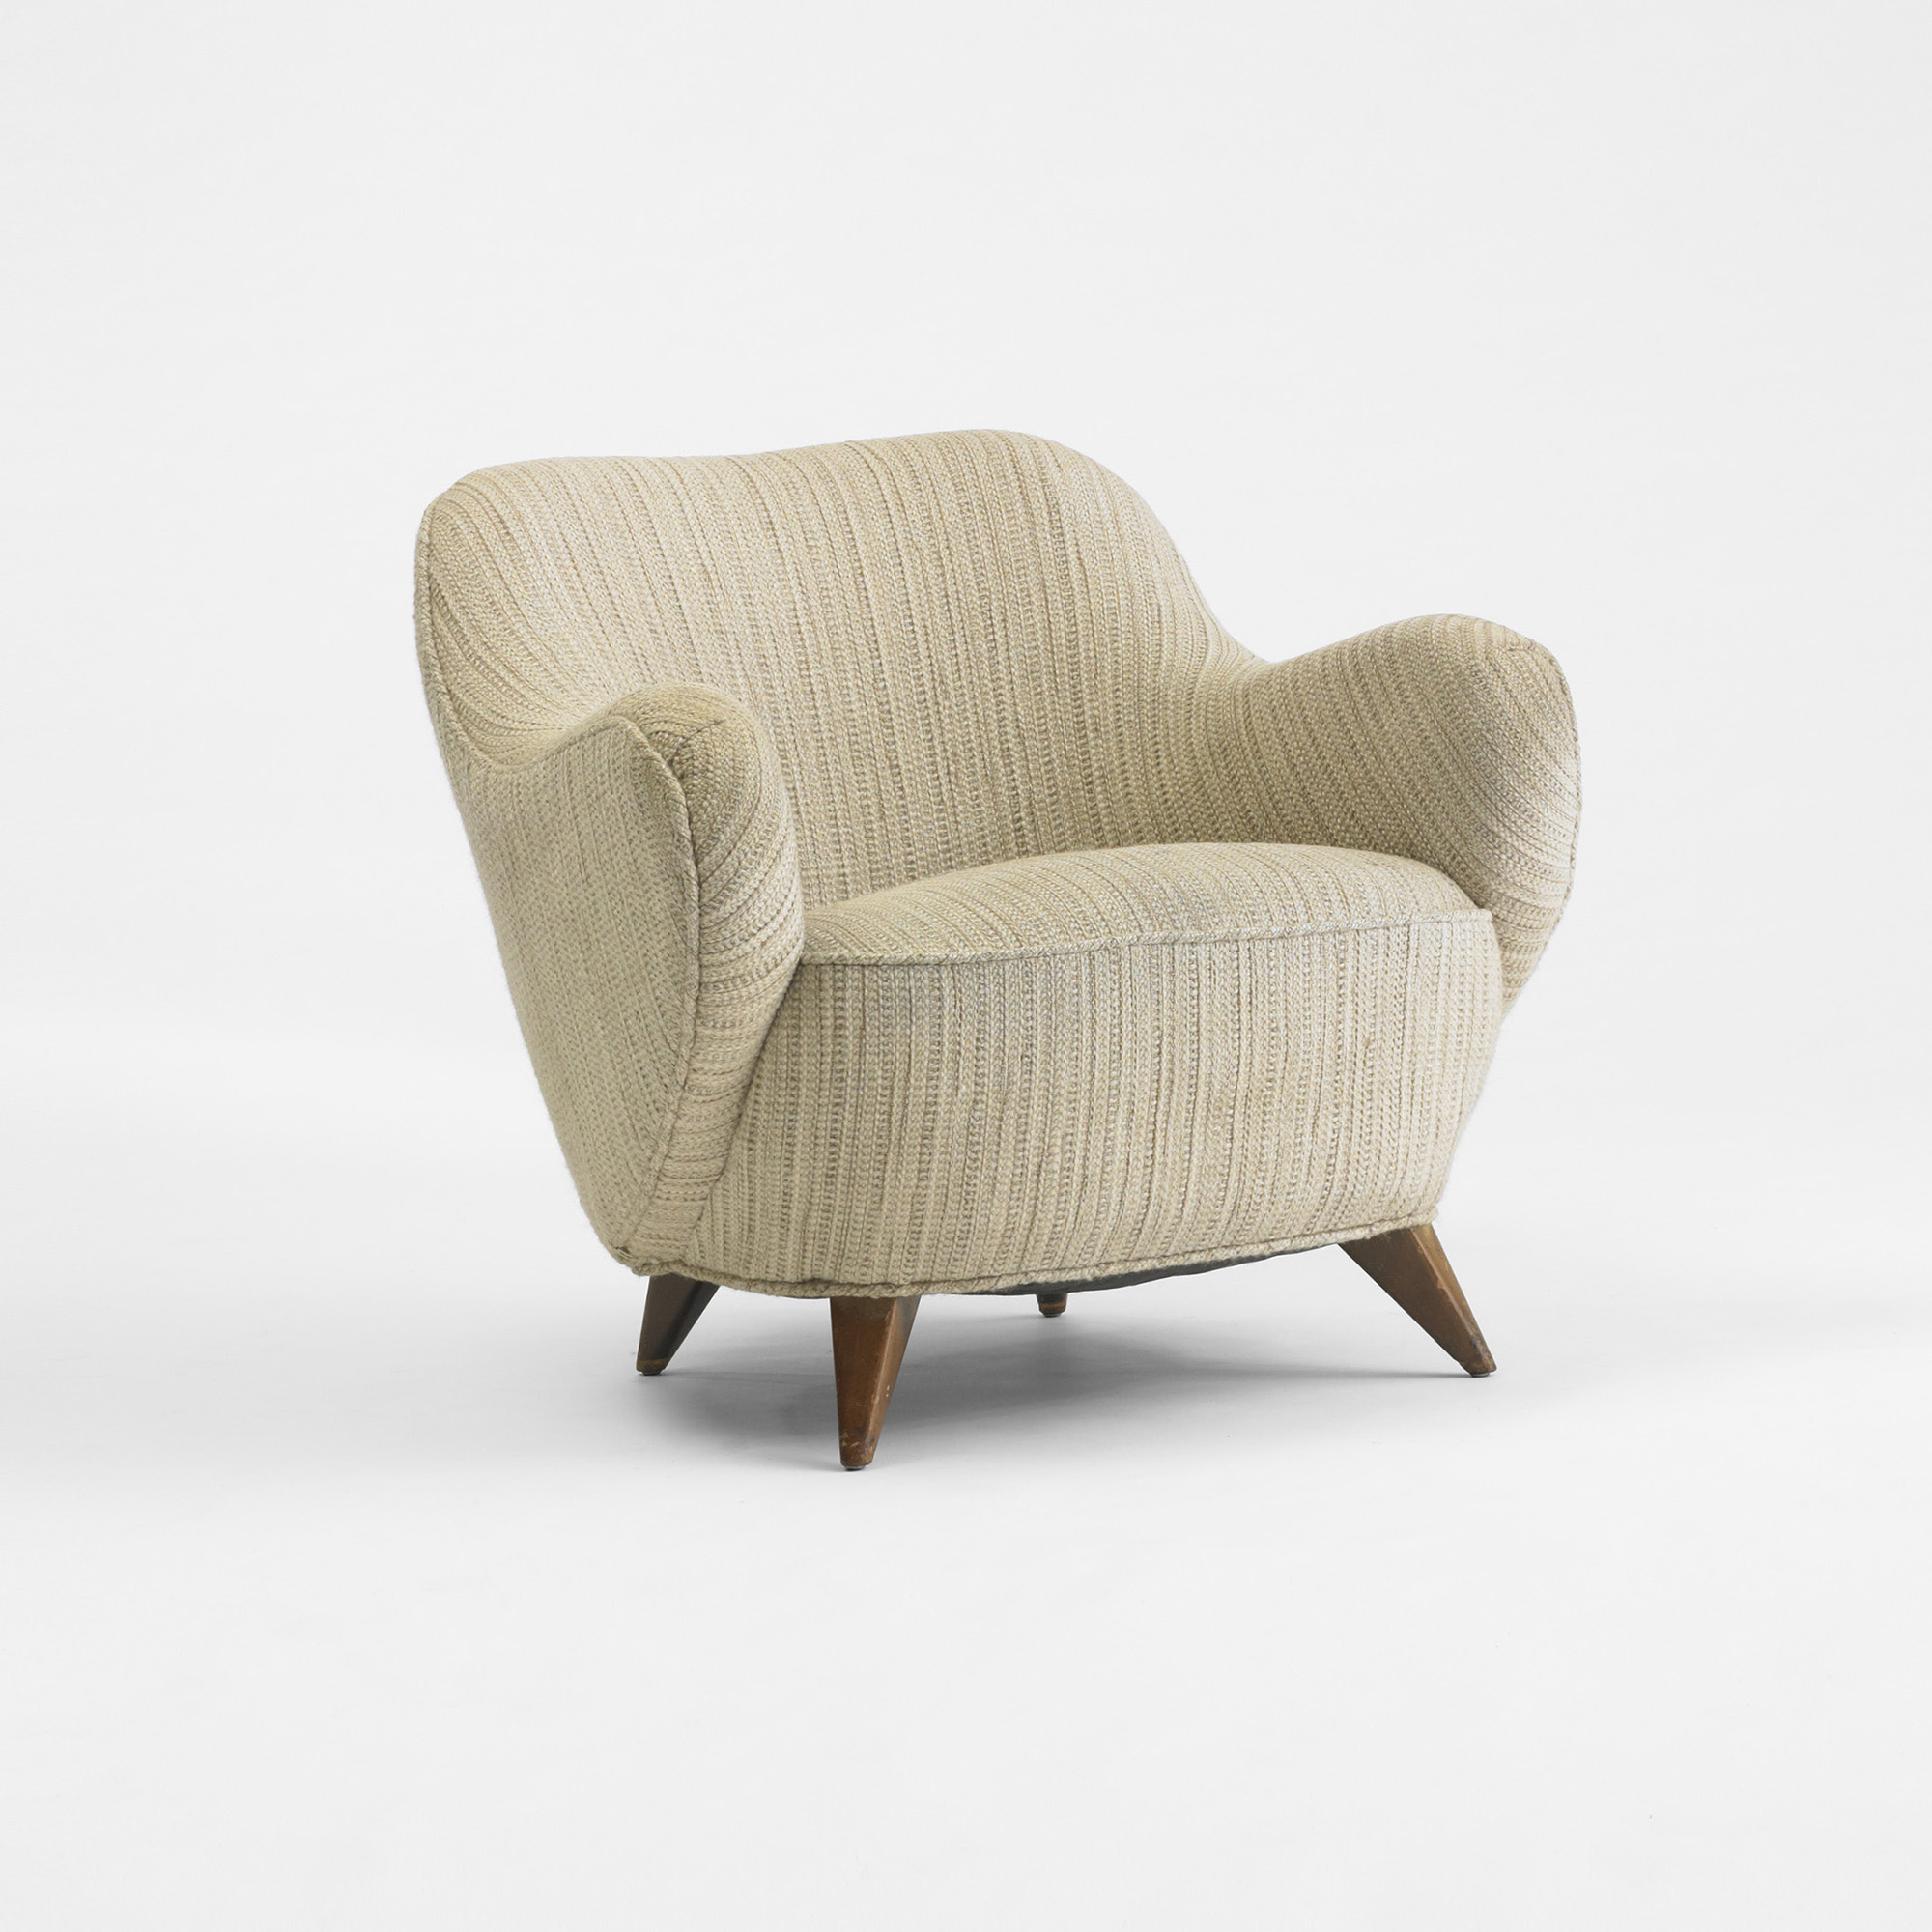 214 Vladimir Kagan Barrel Lounge Chair From A Manhattan Interior 1 Of 3